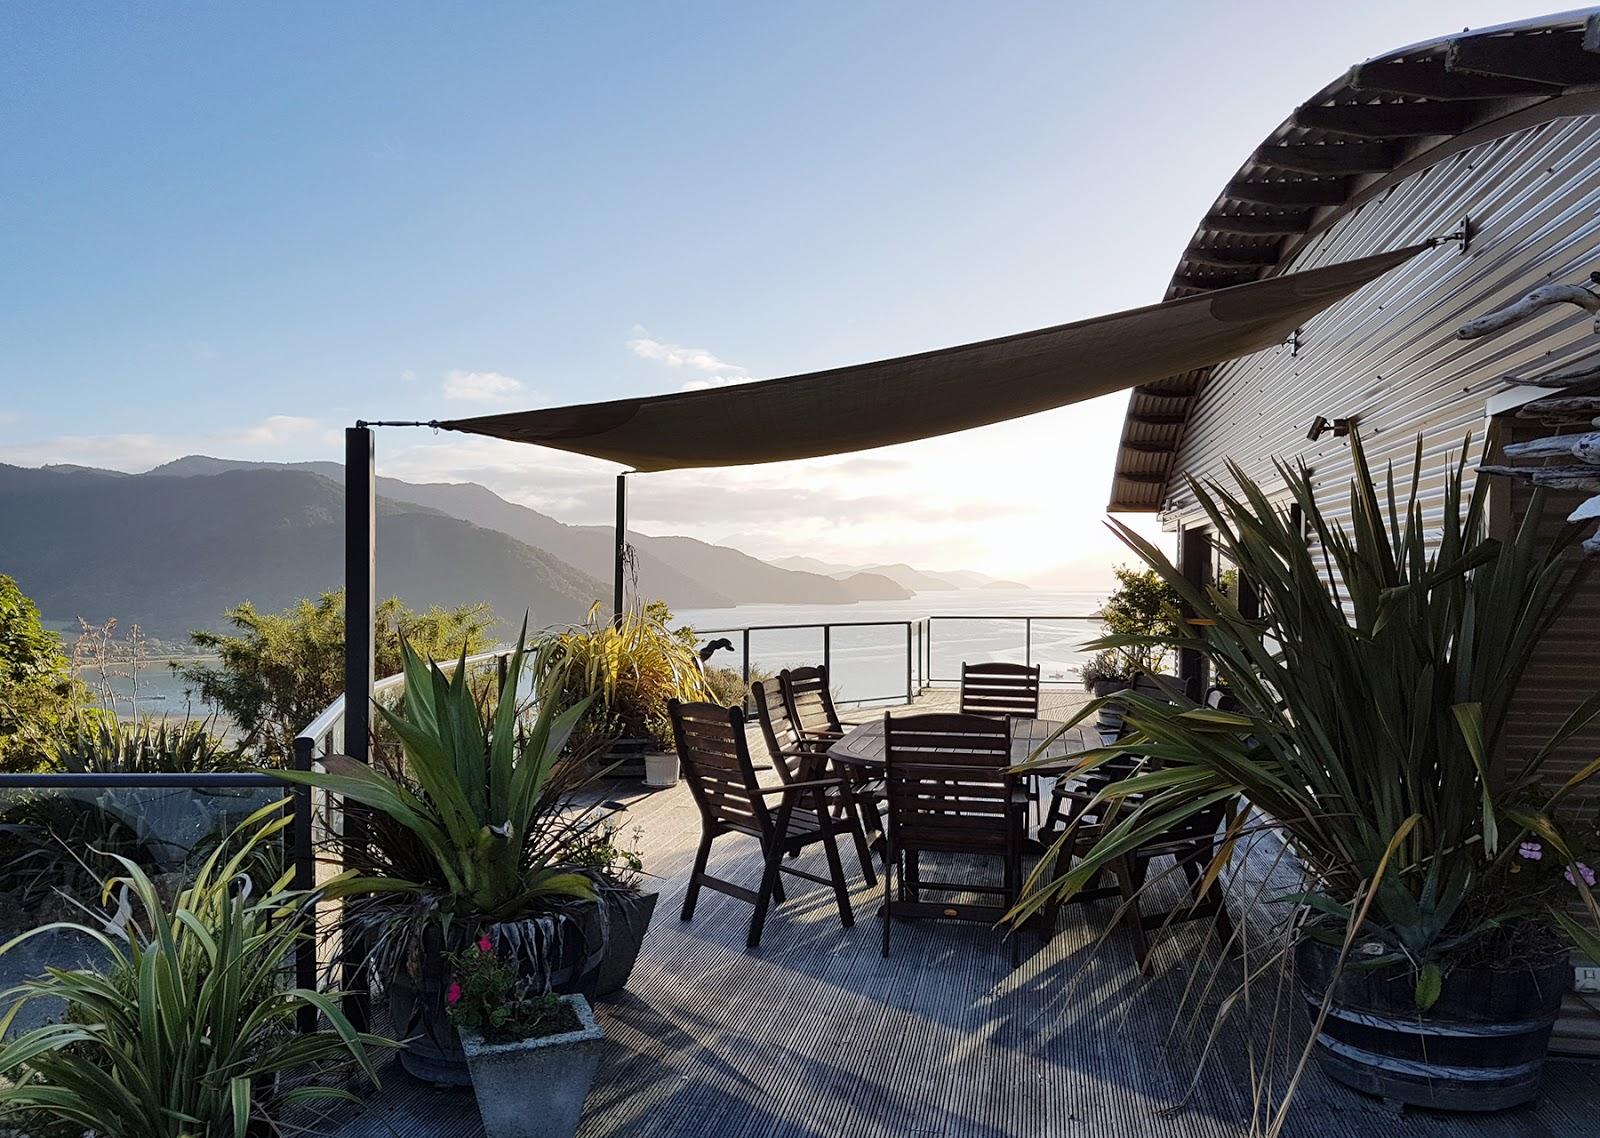 Euriental   luxury travel & style   Okiwa Bay Lodge, South Island, New Zealand